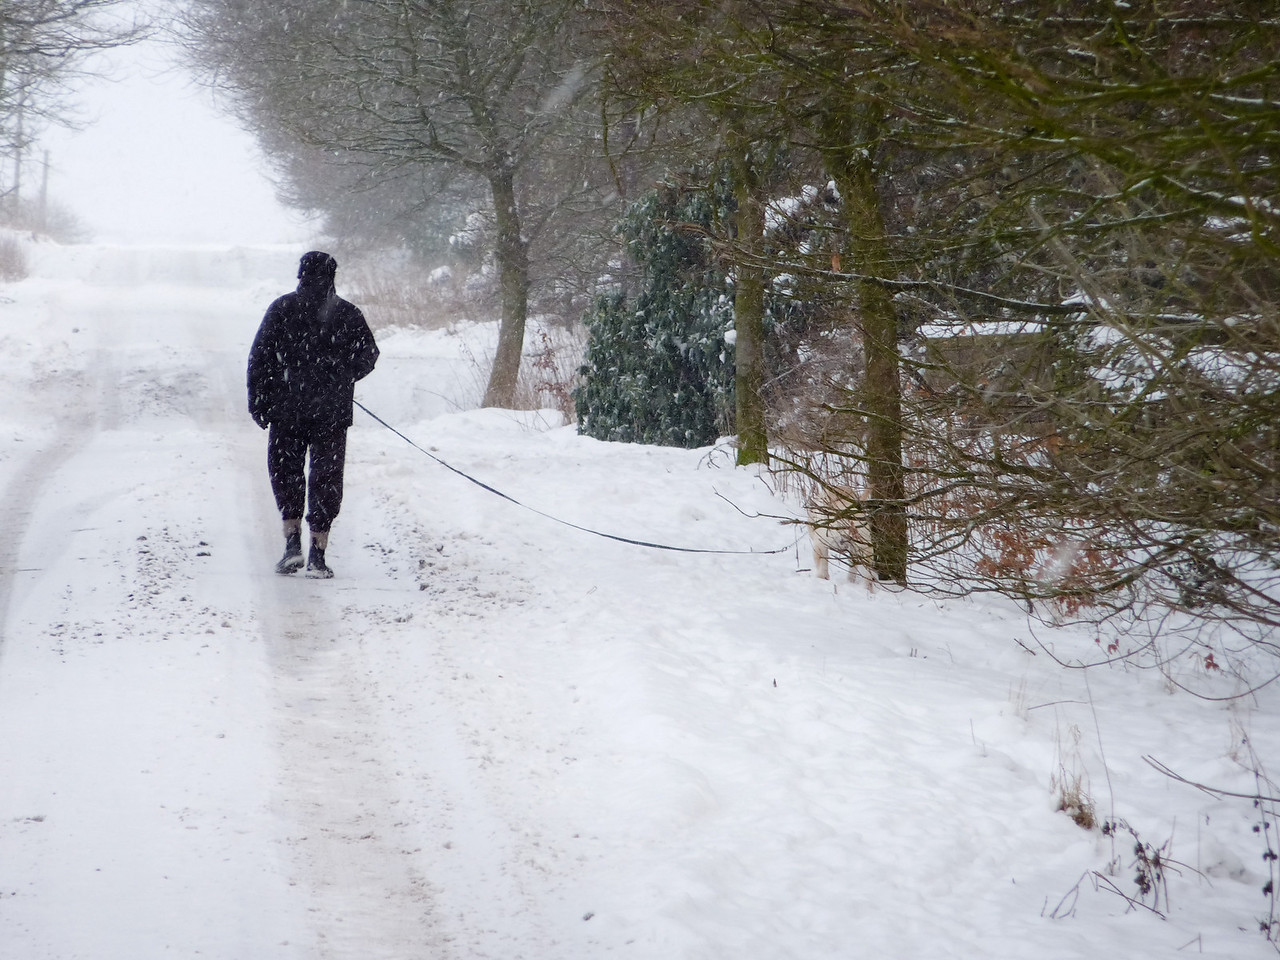 Man walking dog, Ilkley Road, heading towards Keighley Gate.